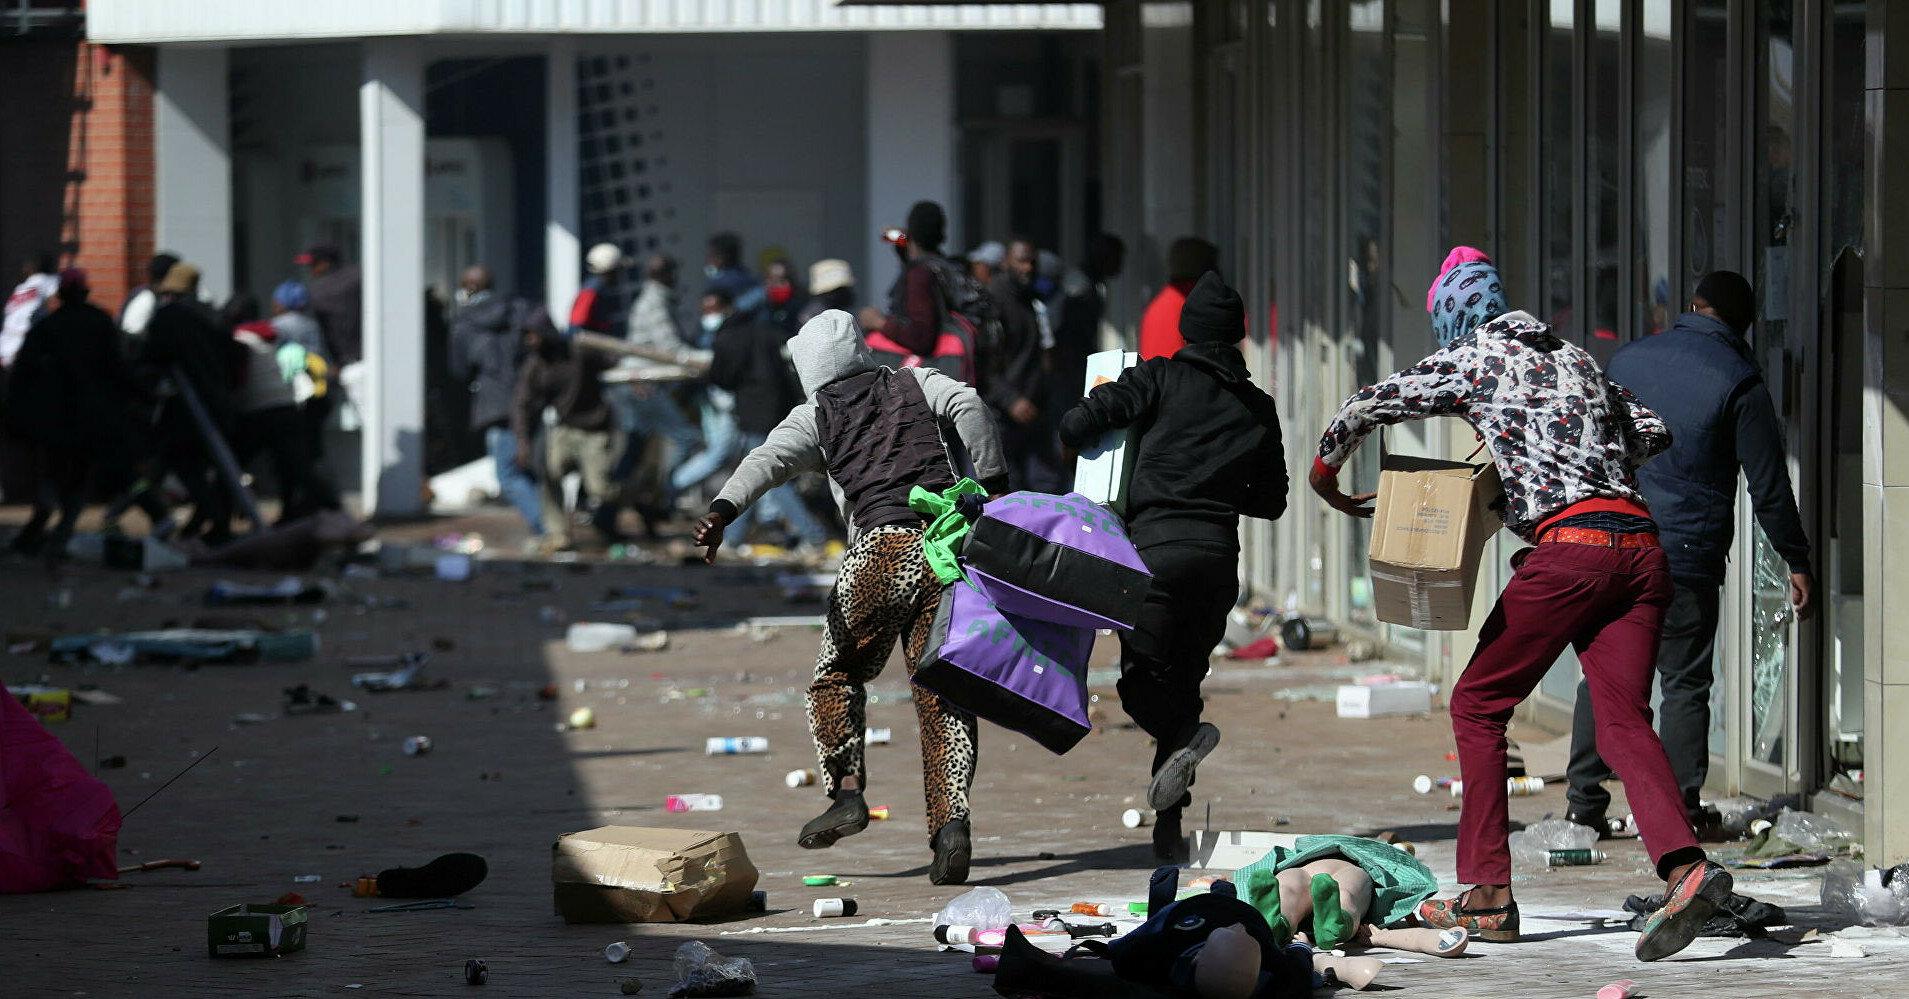 Число жертв протестов в ЮАР превысило 200